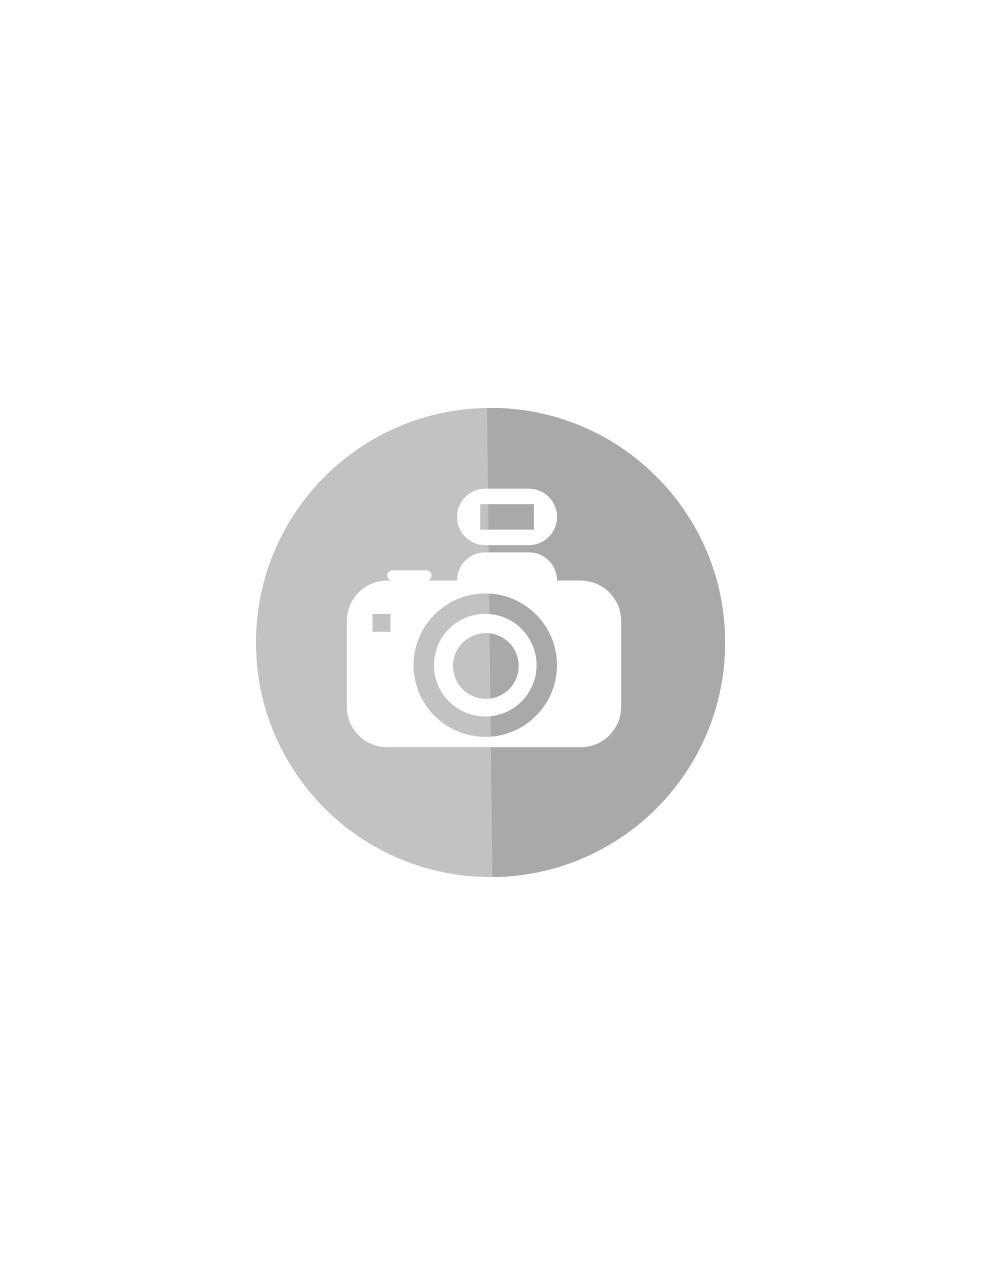 30051750_sparepart/Absperrschranke II